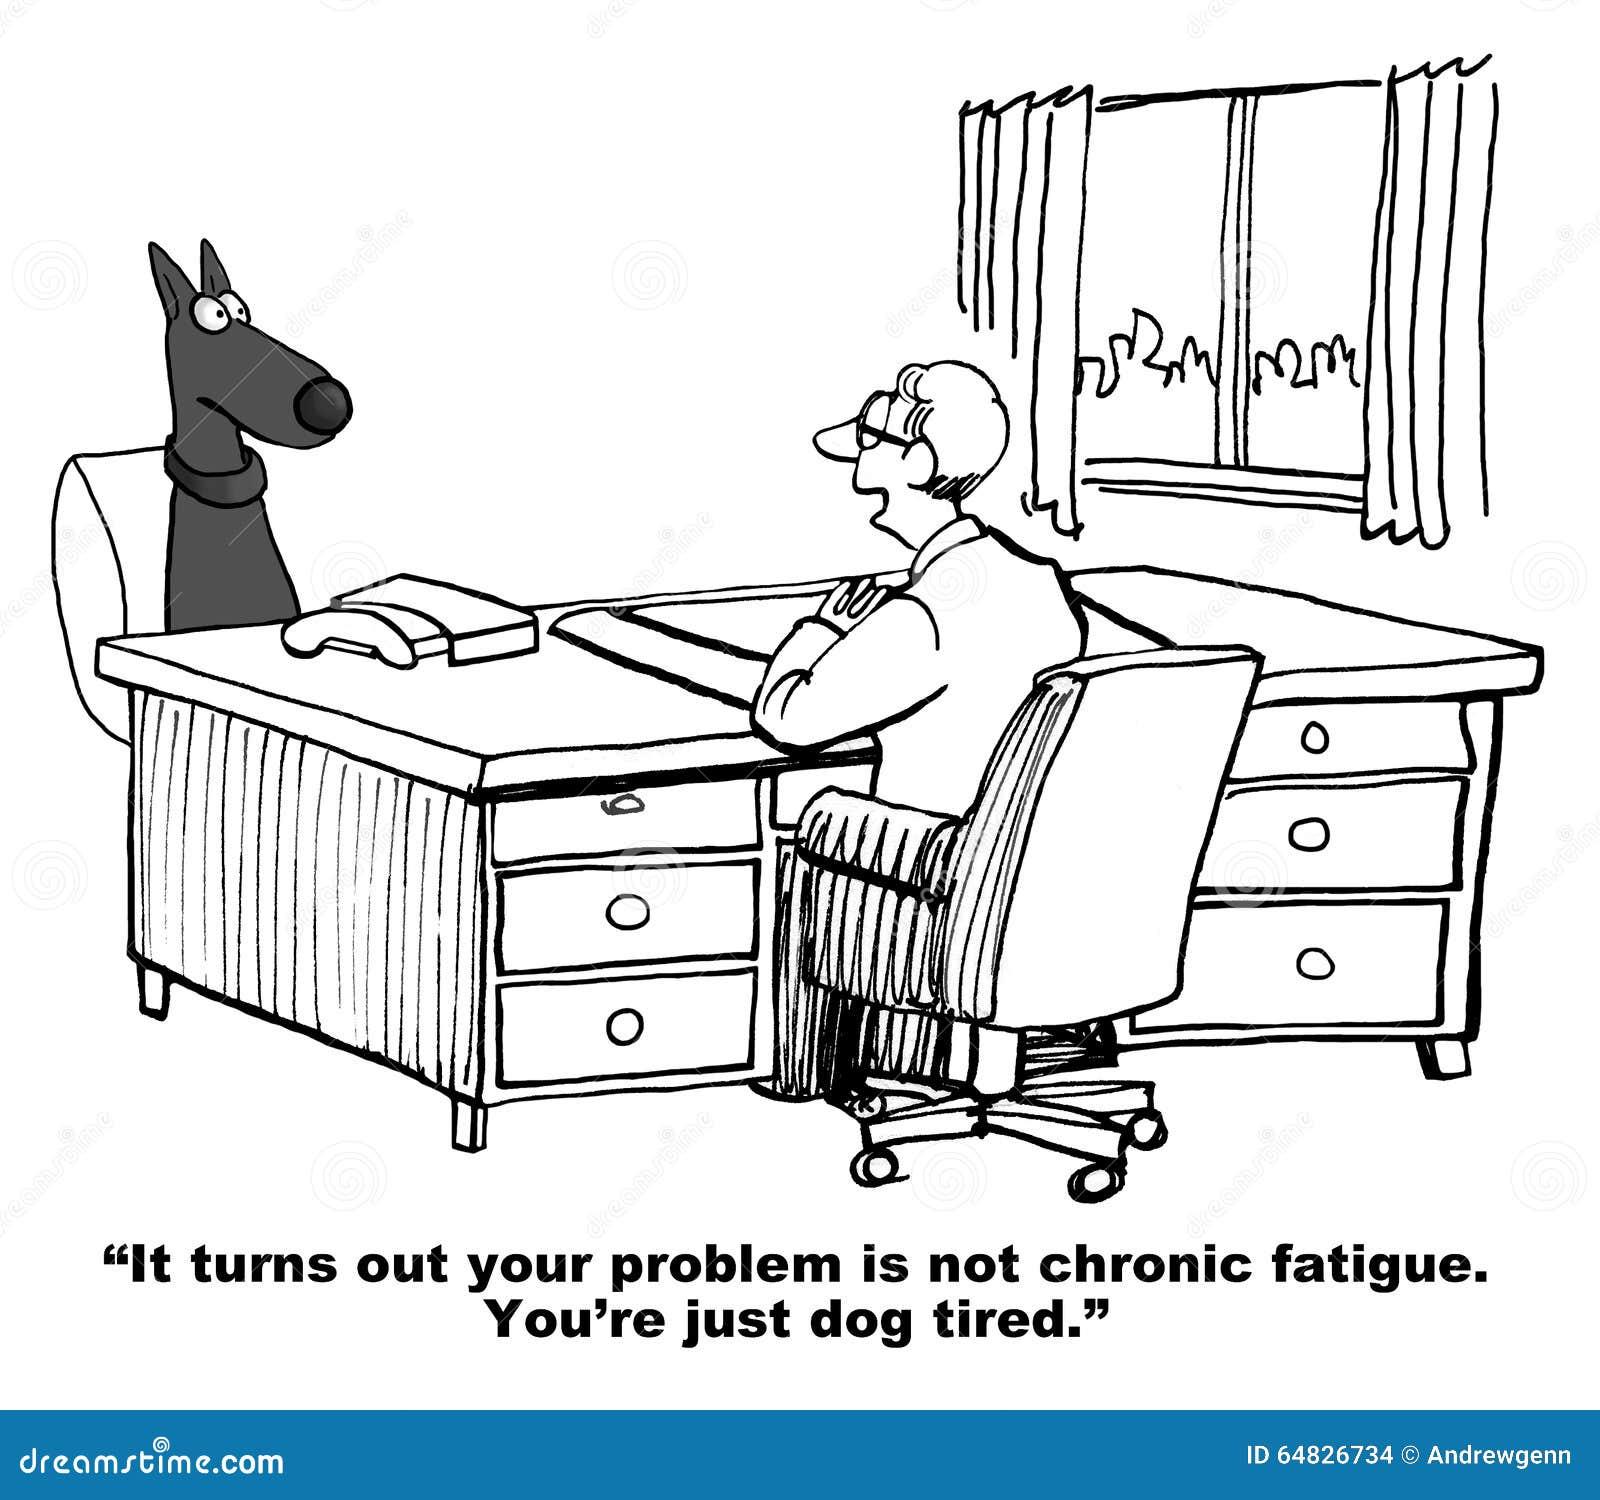 Peachy Dog Is Dog Tired Stock Illustration Illustration Of Comics Download Free Architecture Designs Scobabritishbridgeorg